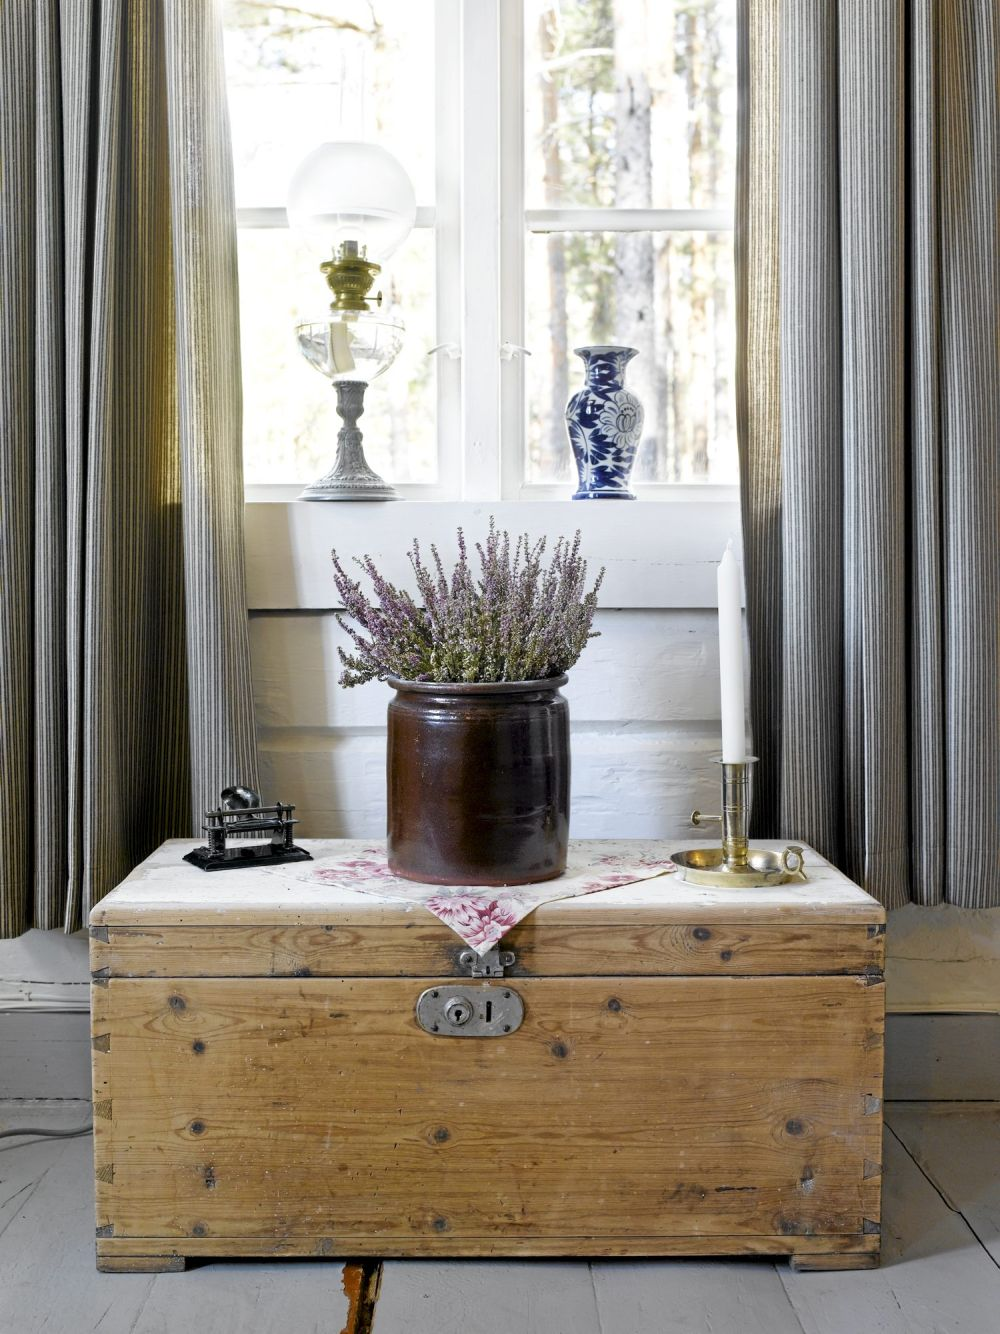 adelaparvu.com despre cabana in padure cu interior romantic, Foto Erik Jæger 18